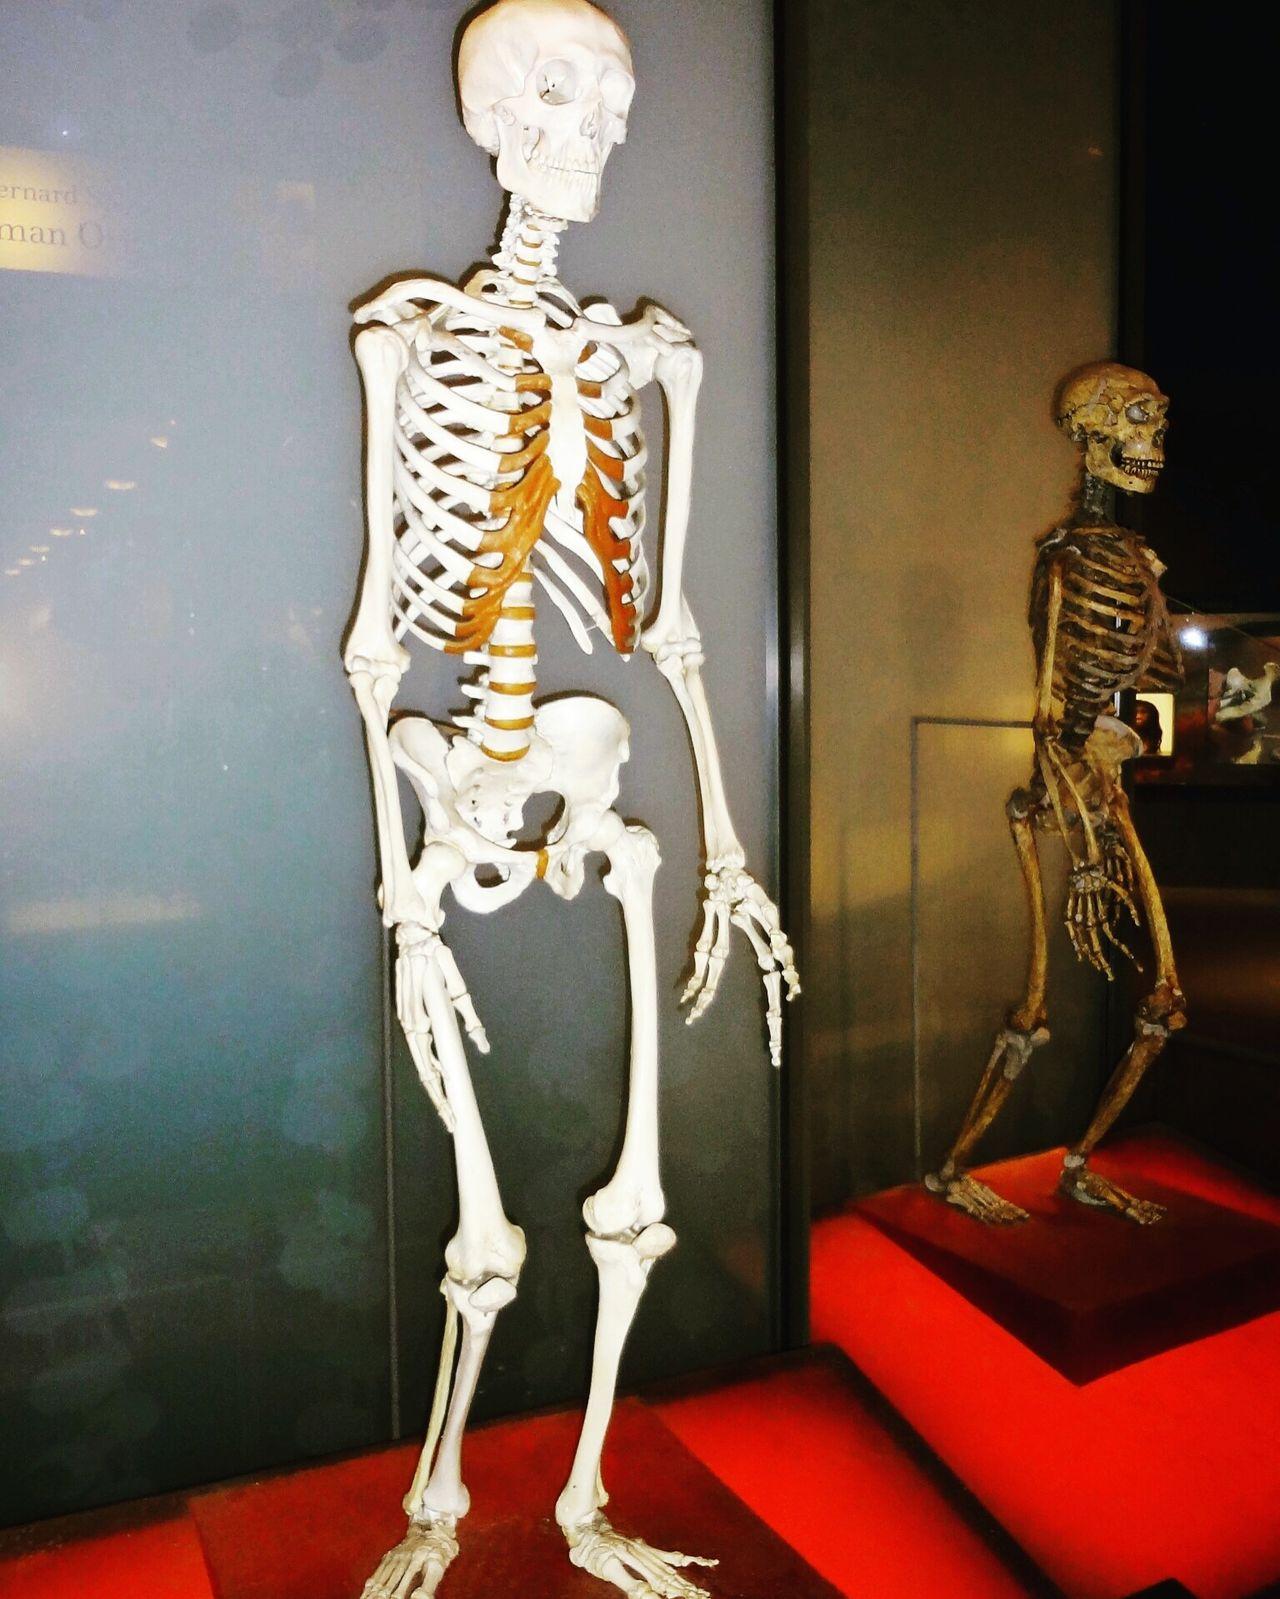 Human Skeleton Human Bone Indoors  Human Skull Bone  People Day museum of wax in DC